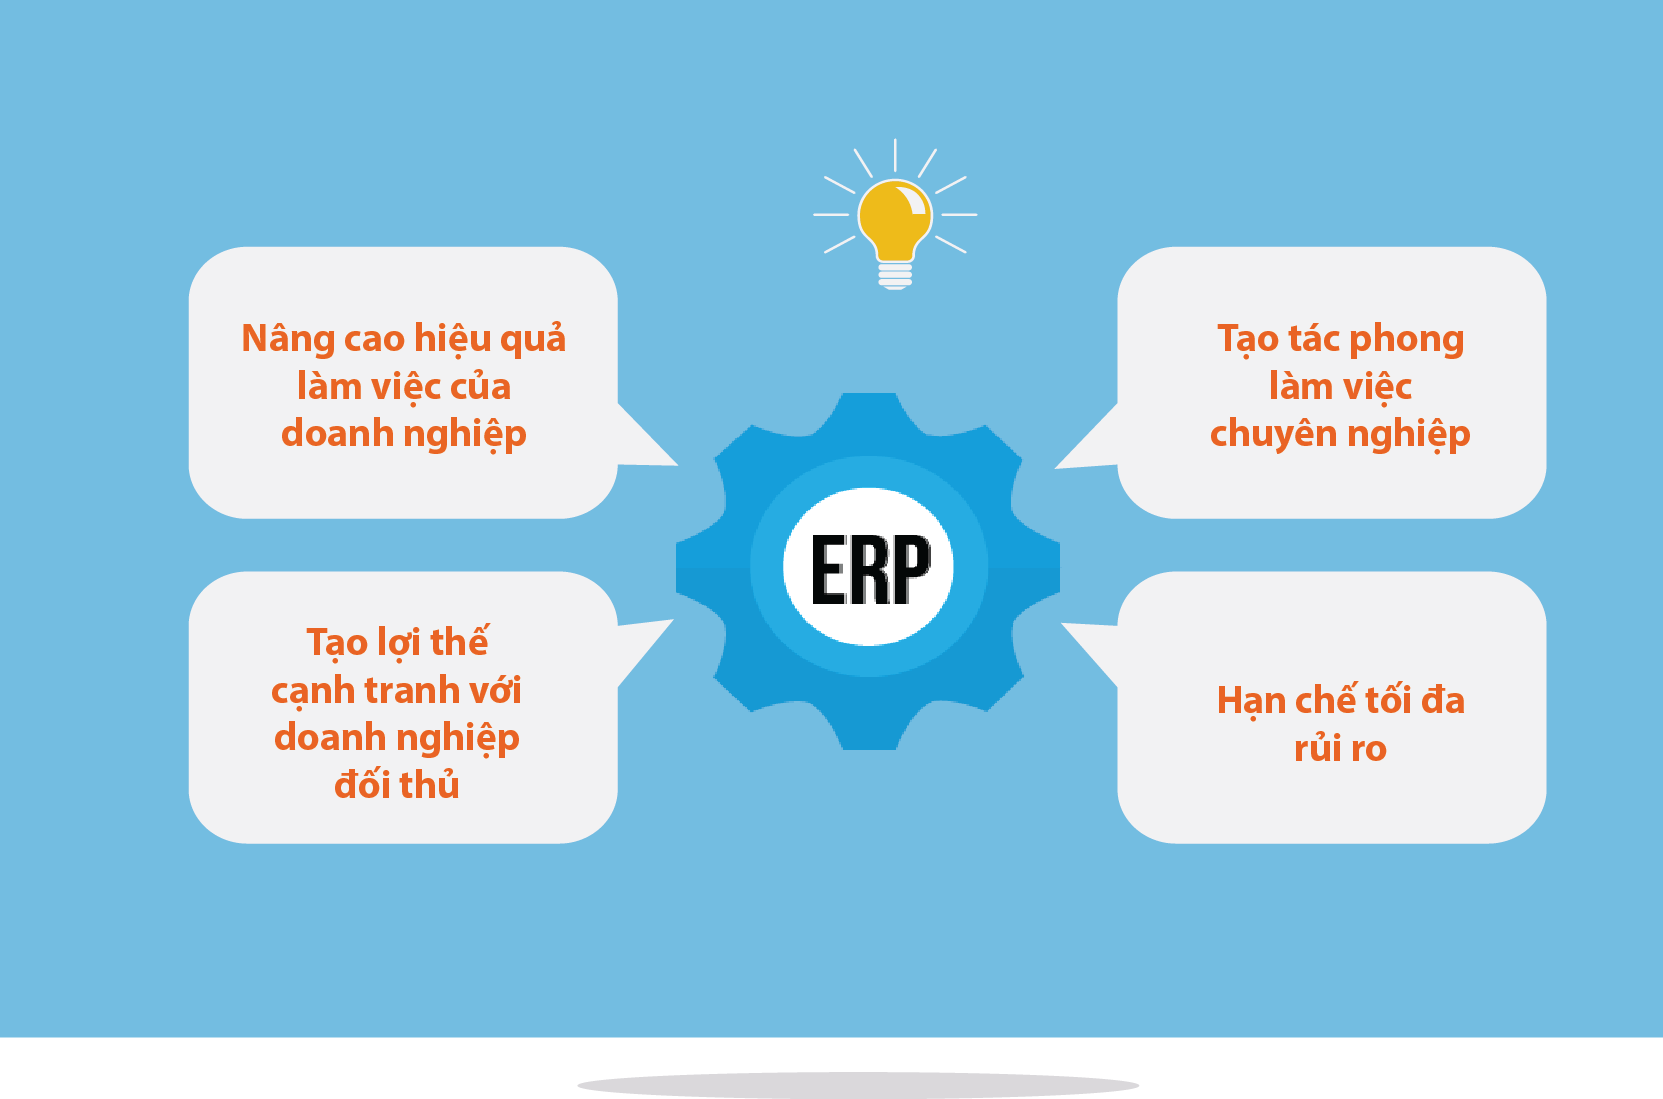 ERP cho doanh nghiep thoi dai 4.0